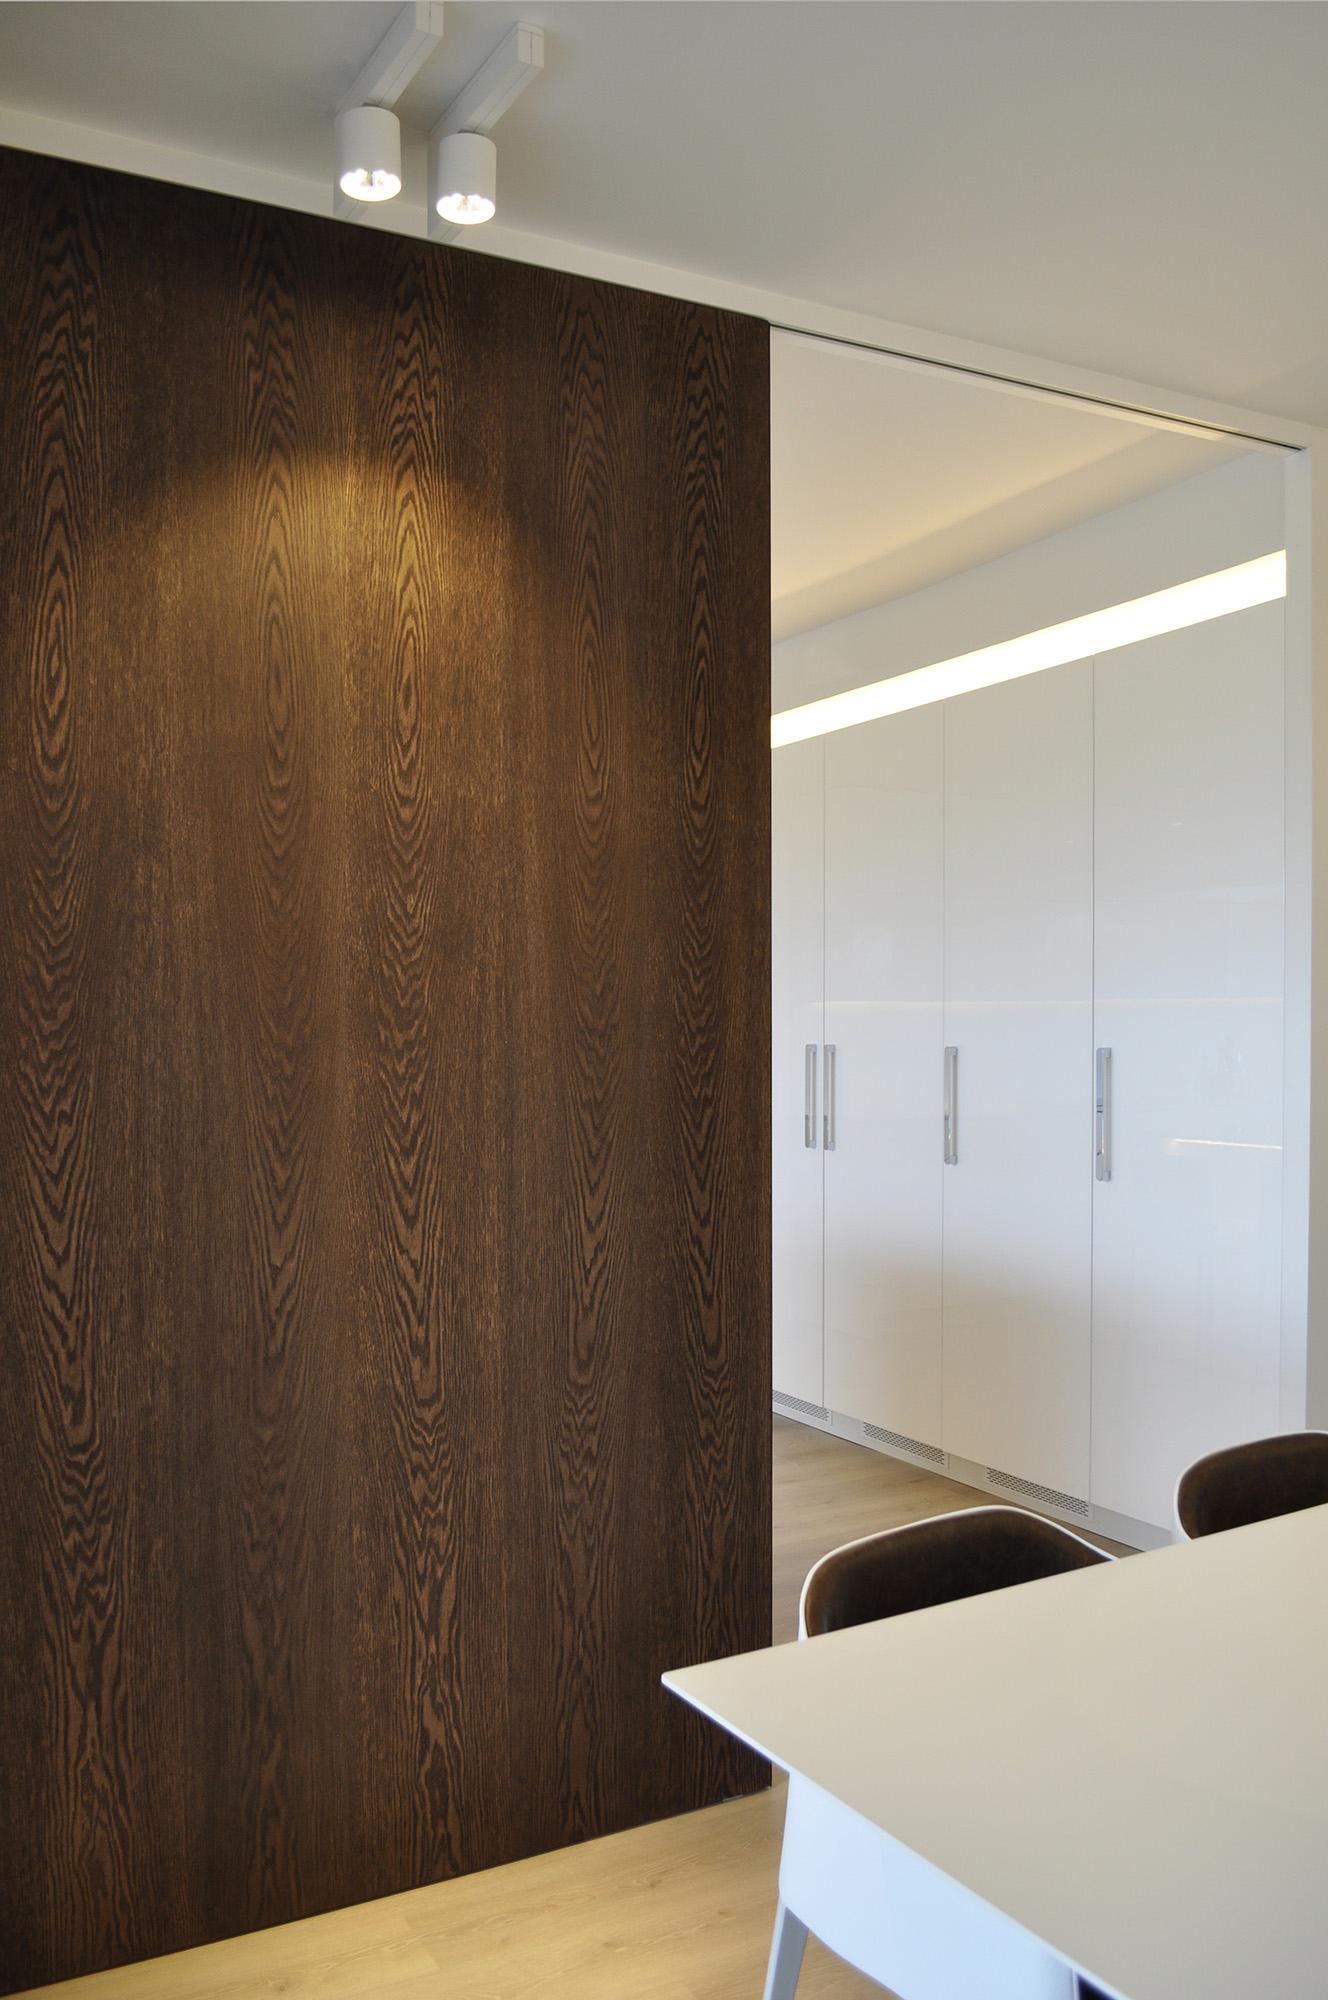 7-interior-architect-barcelona-sitges-renovation-wooden-detail